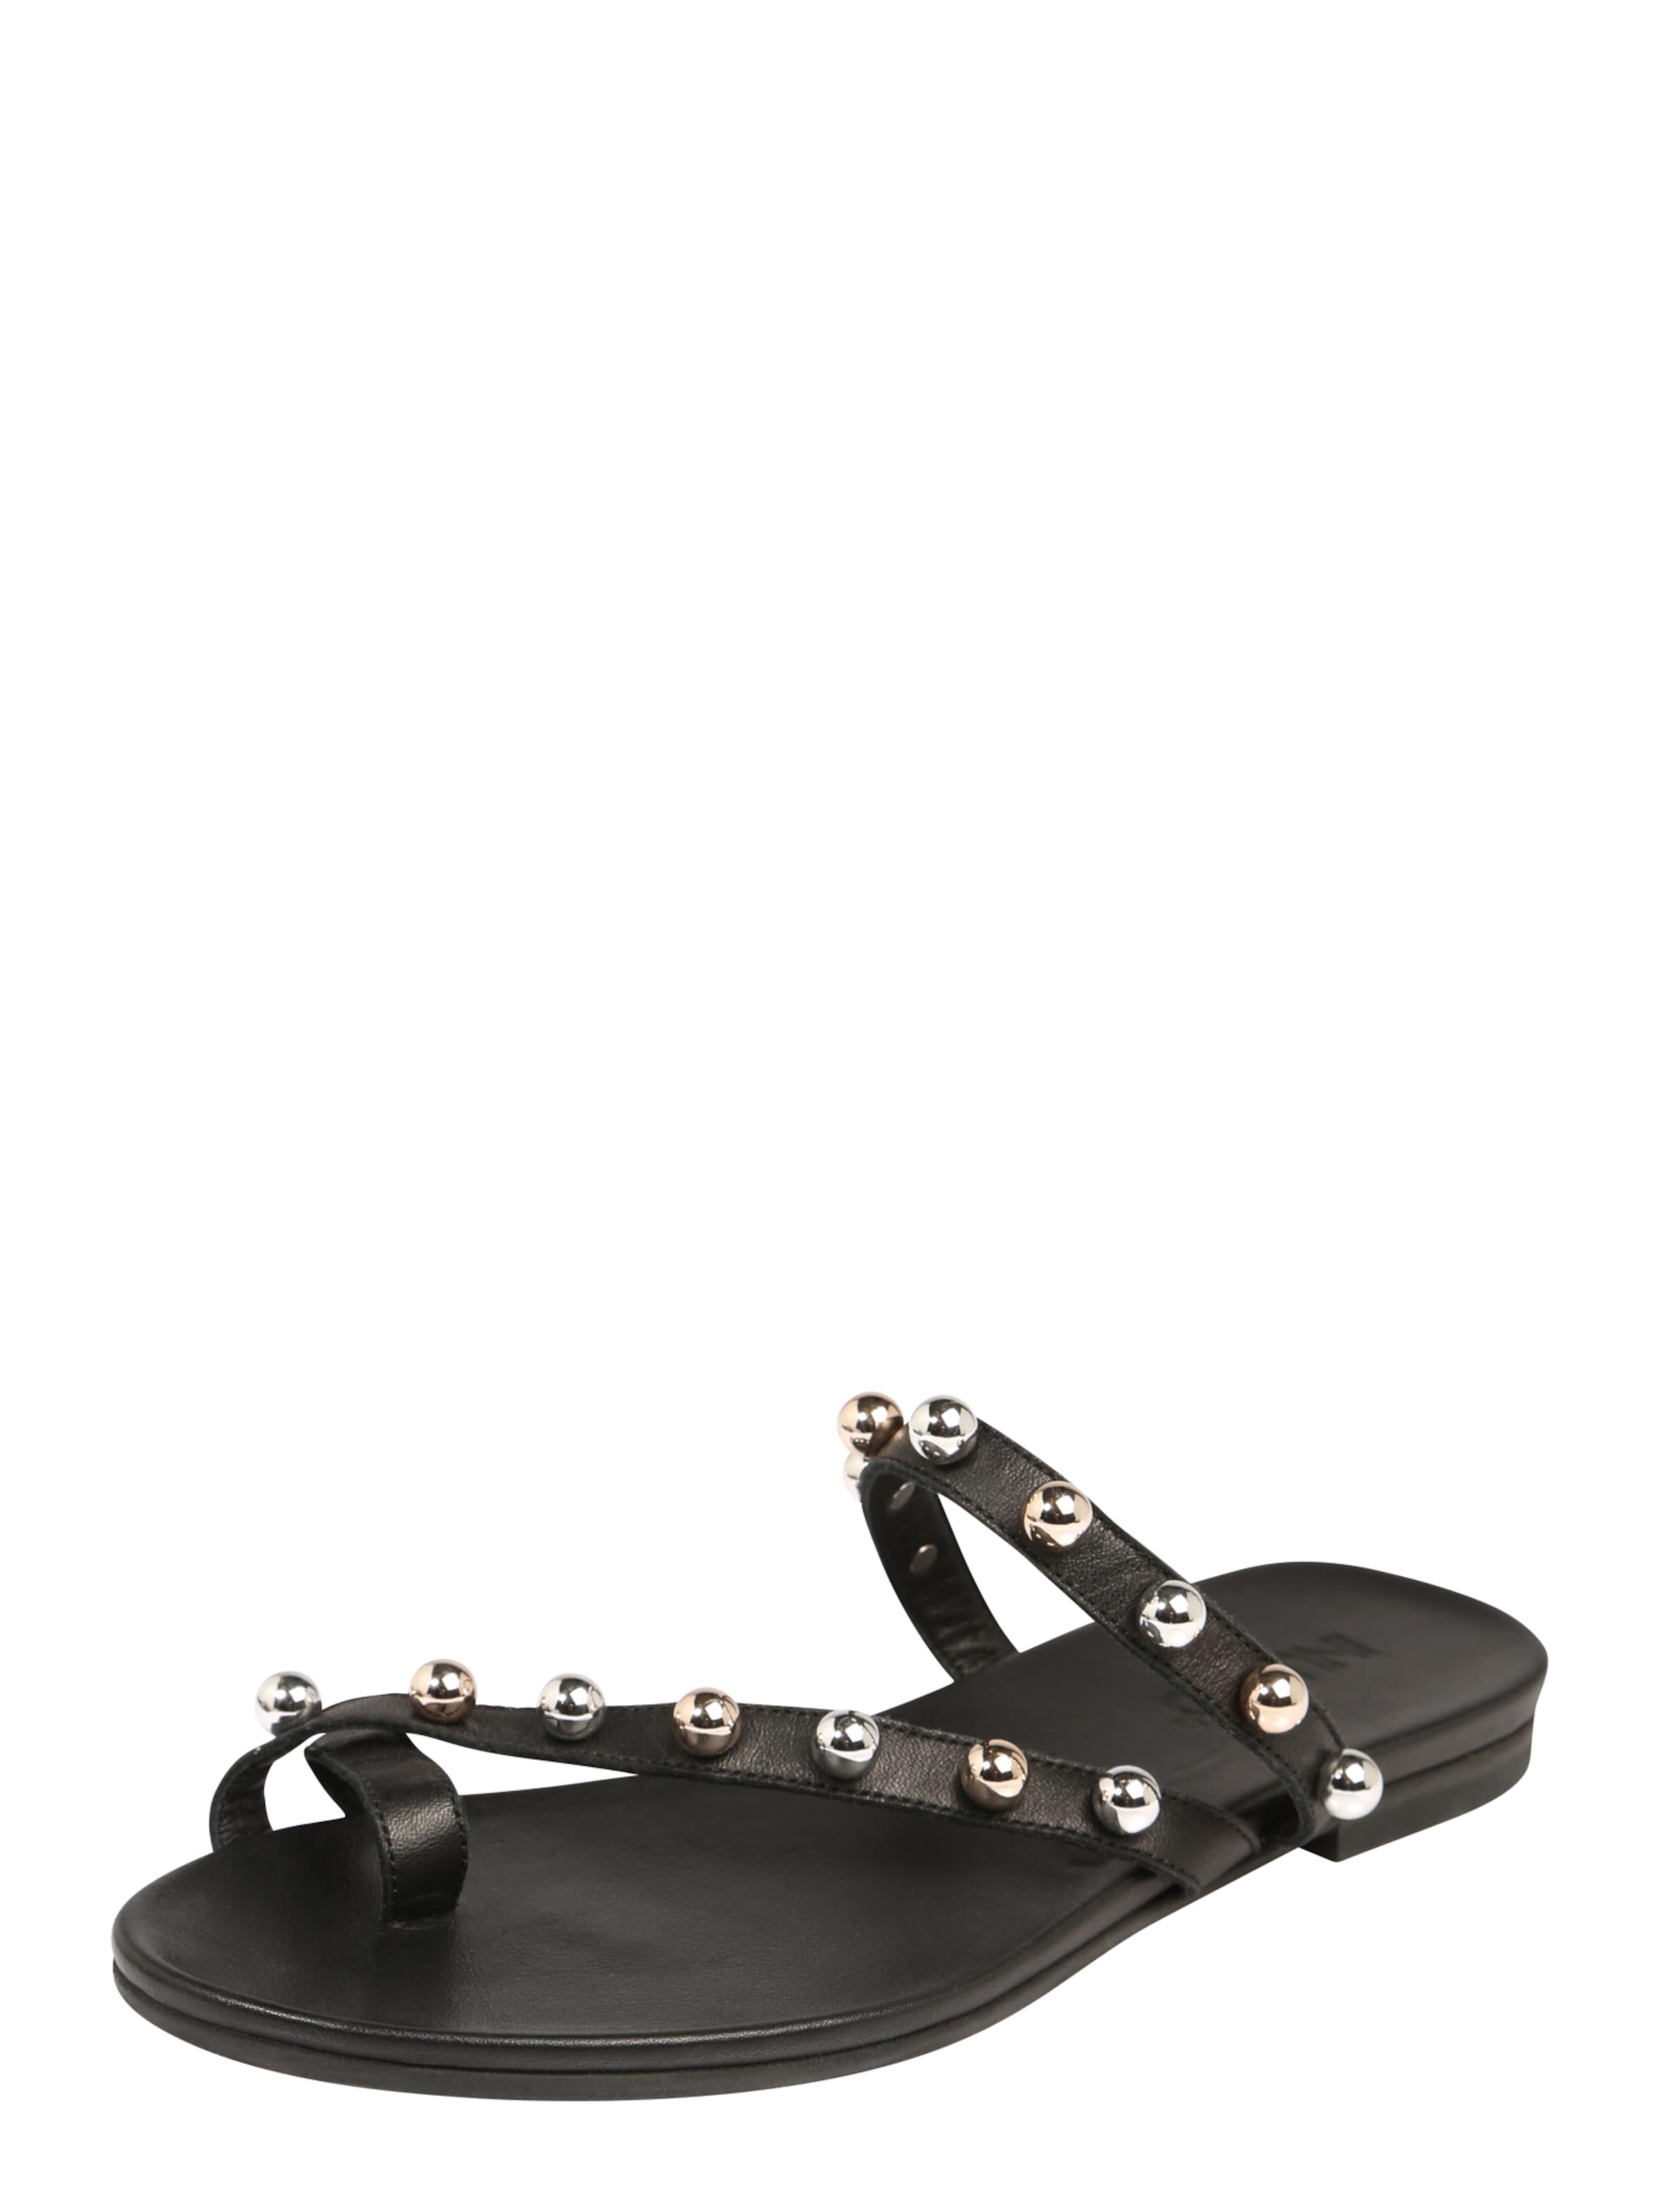 Haltbare Mode billige Schuhe INUOVO | Sandalen Schuhe Gut getragene Schuhe